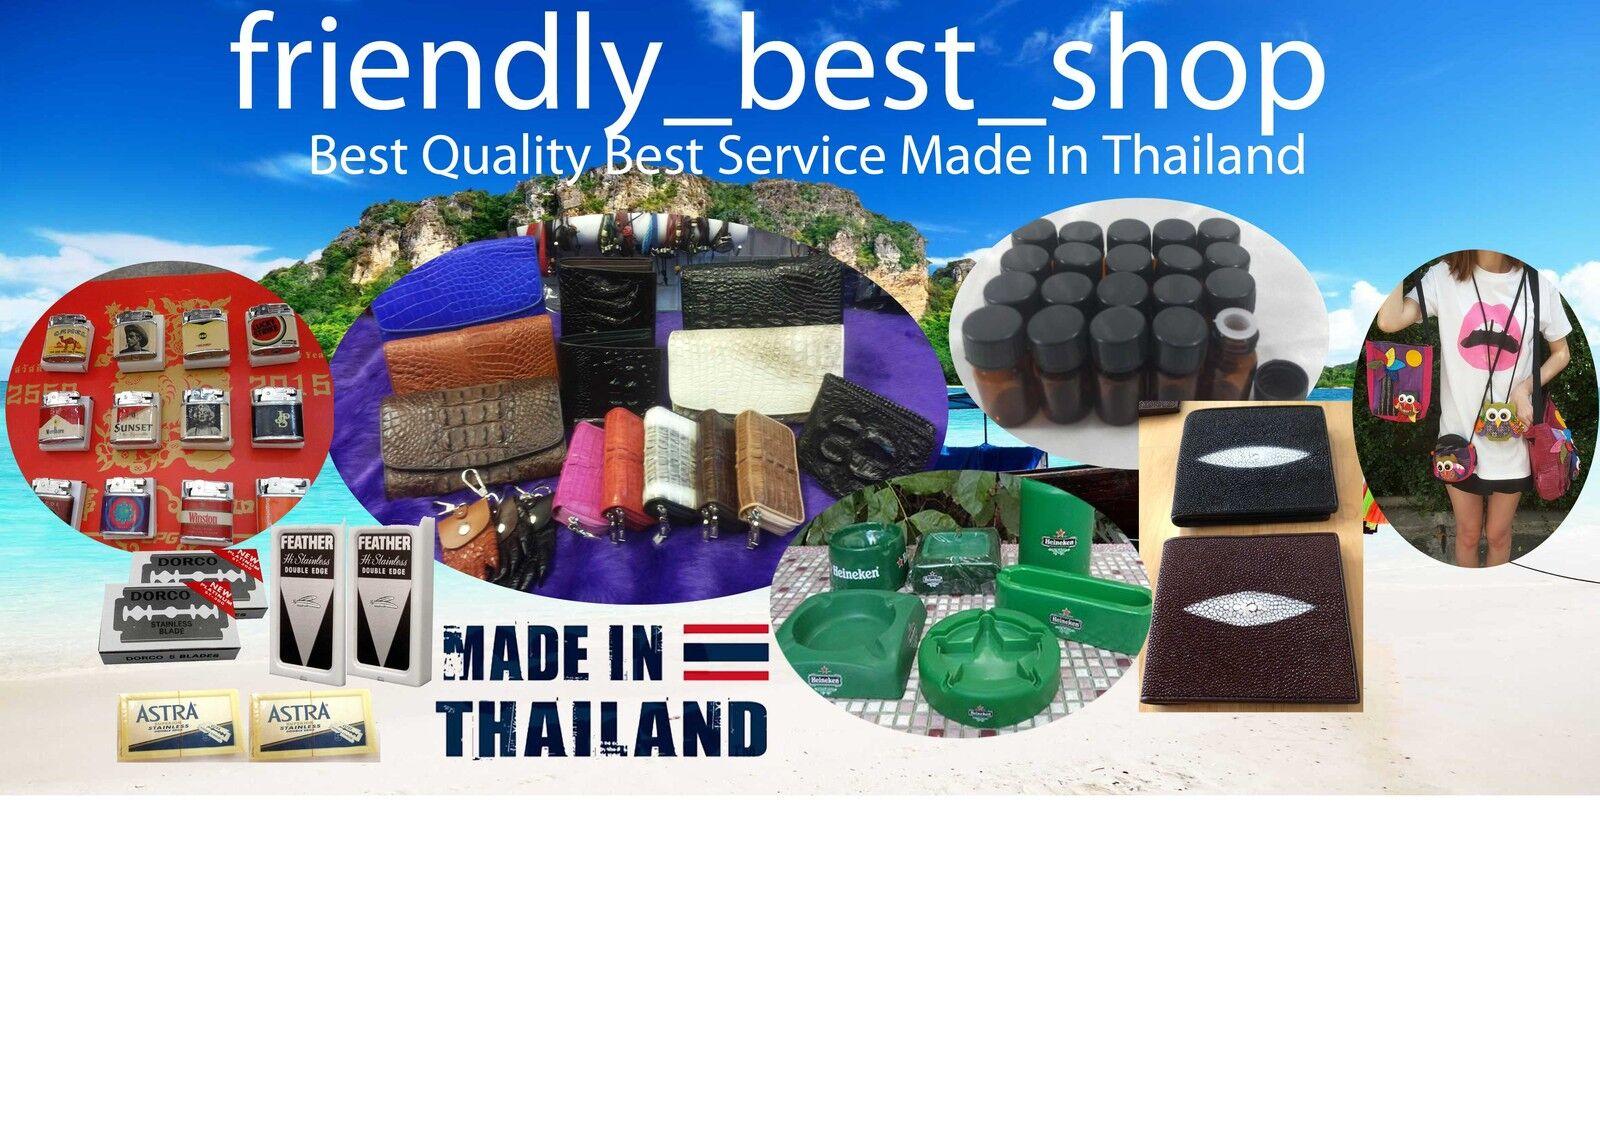 friendly_best_shop